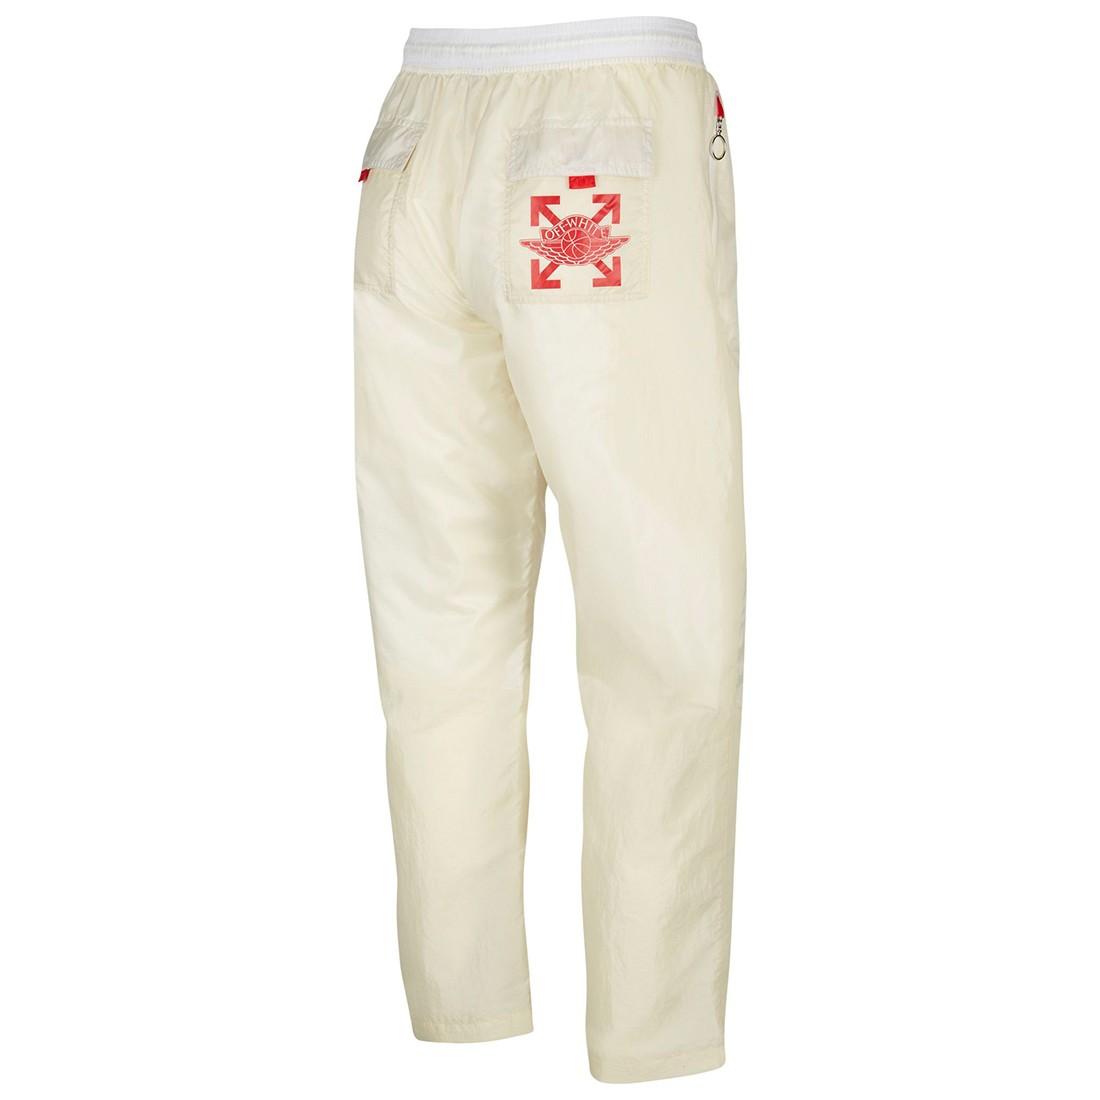 Jordan Men Jordan x Off-Whit Pants (fossil / sail / university red)